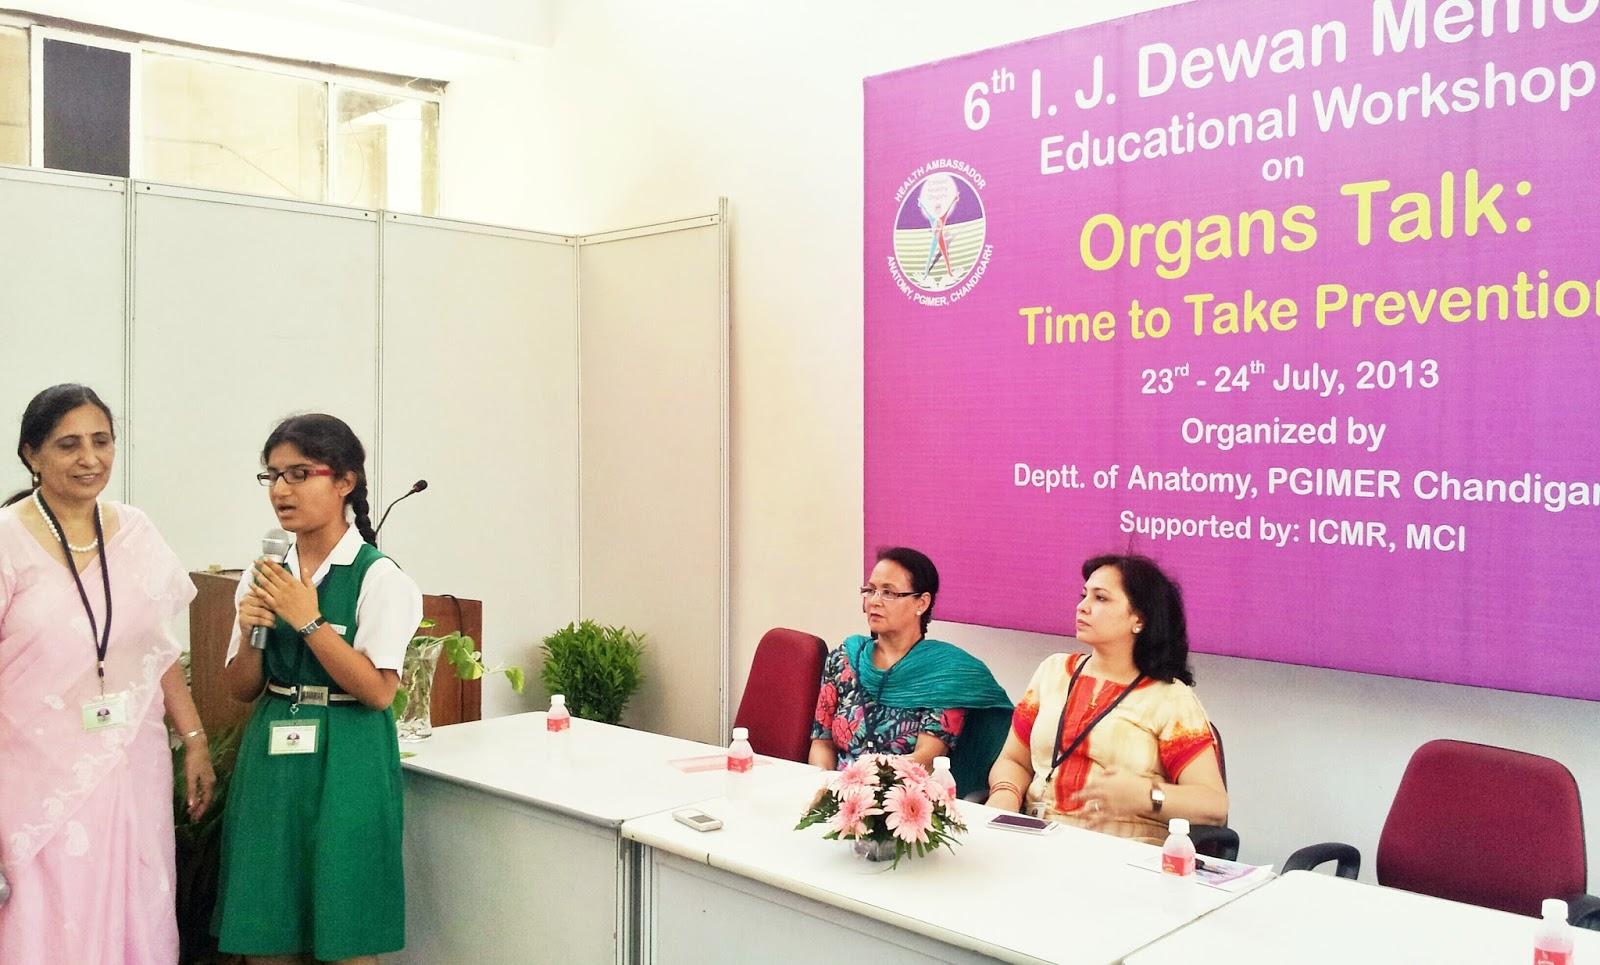 rotary club of chandigarh club news  at the inauguration of the workshop on 23 our club was represented by r ann hark mejie r ann alpna khanna and rtn desh deepak khanna